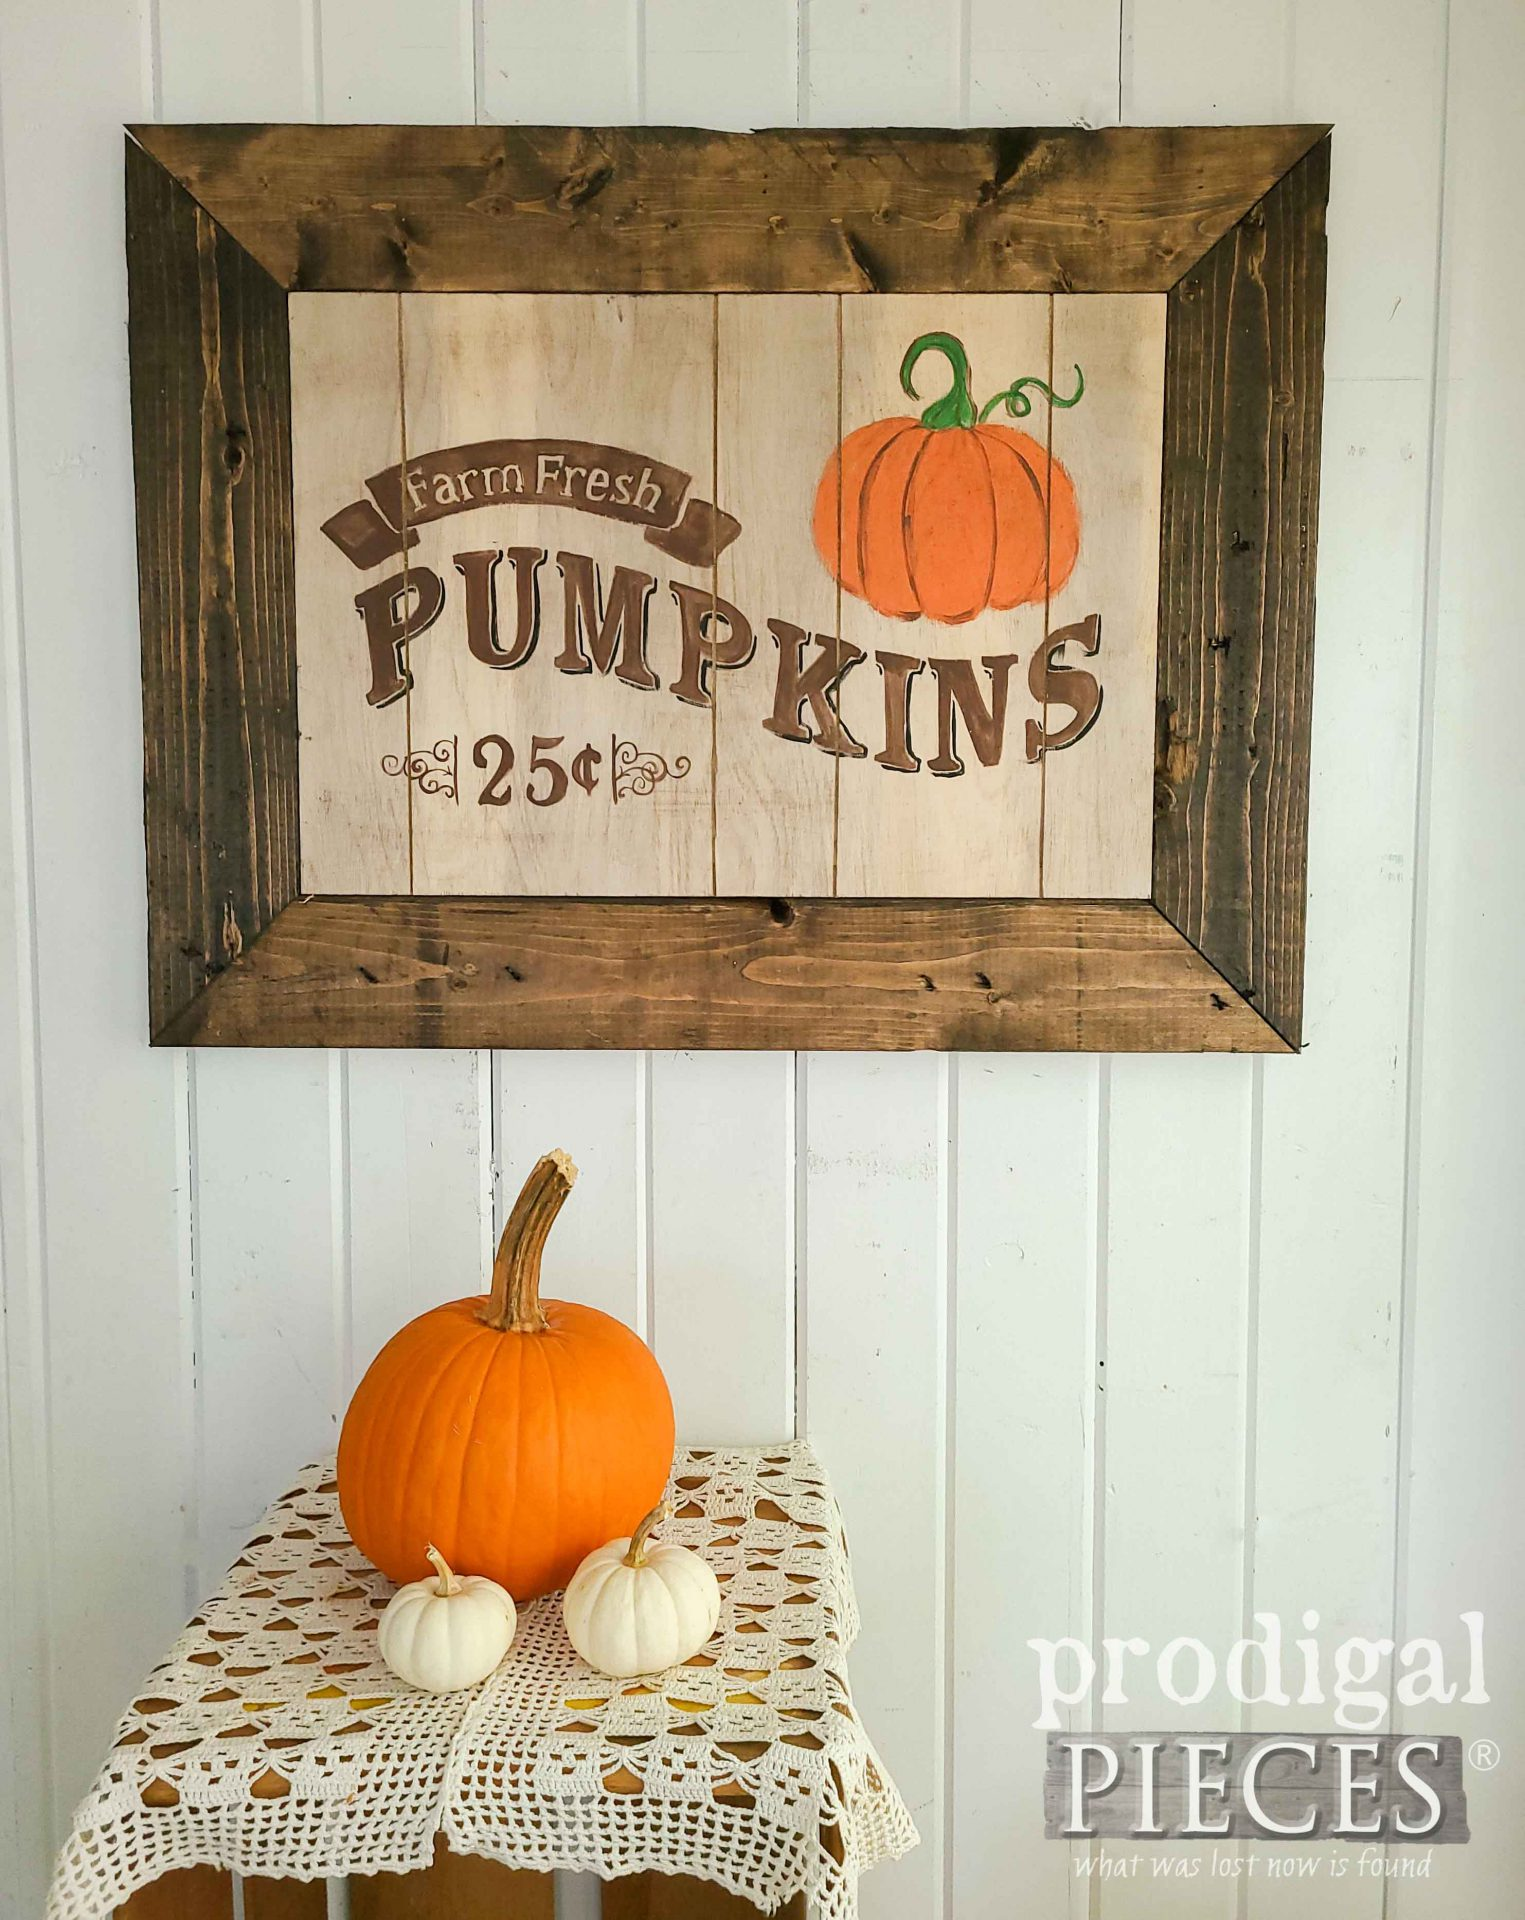 Farmhouse Pumpkin Harvest Sign by Larissa of Prodigal Pieces   prodigalpieces.com #prodigalpieces #farmhouse #diy #home #homedecor #fall